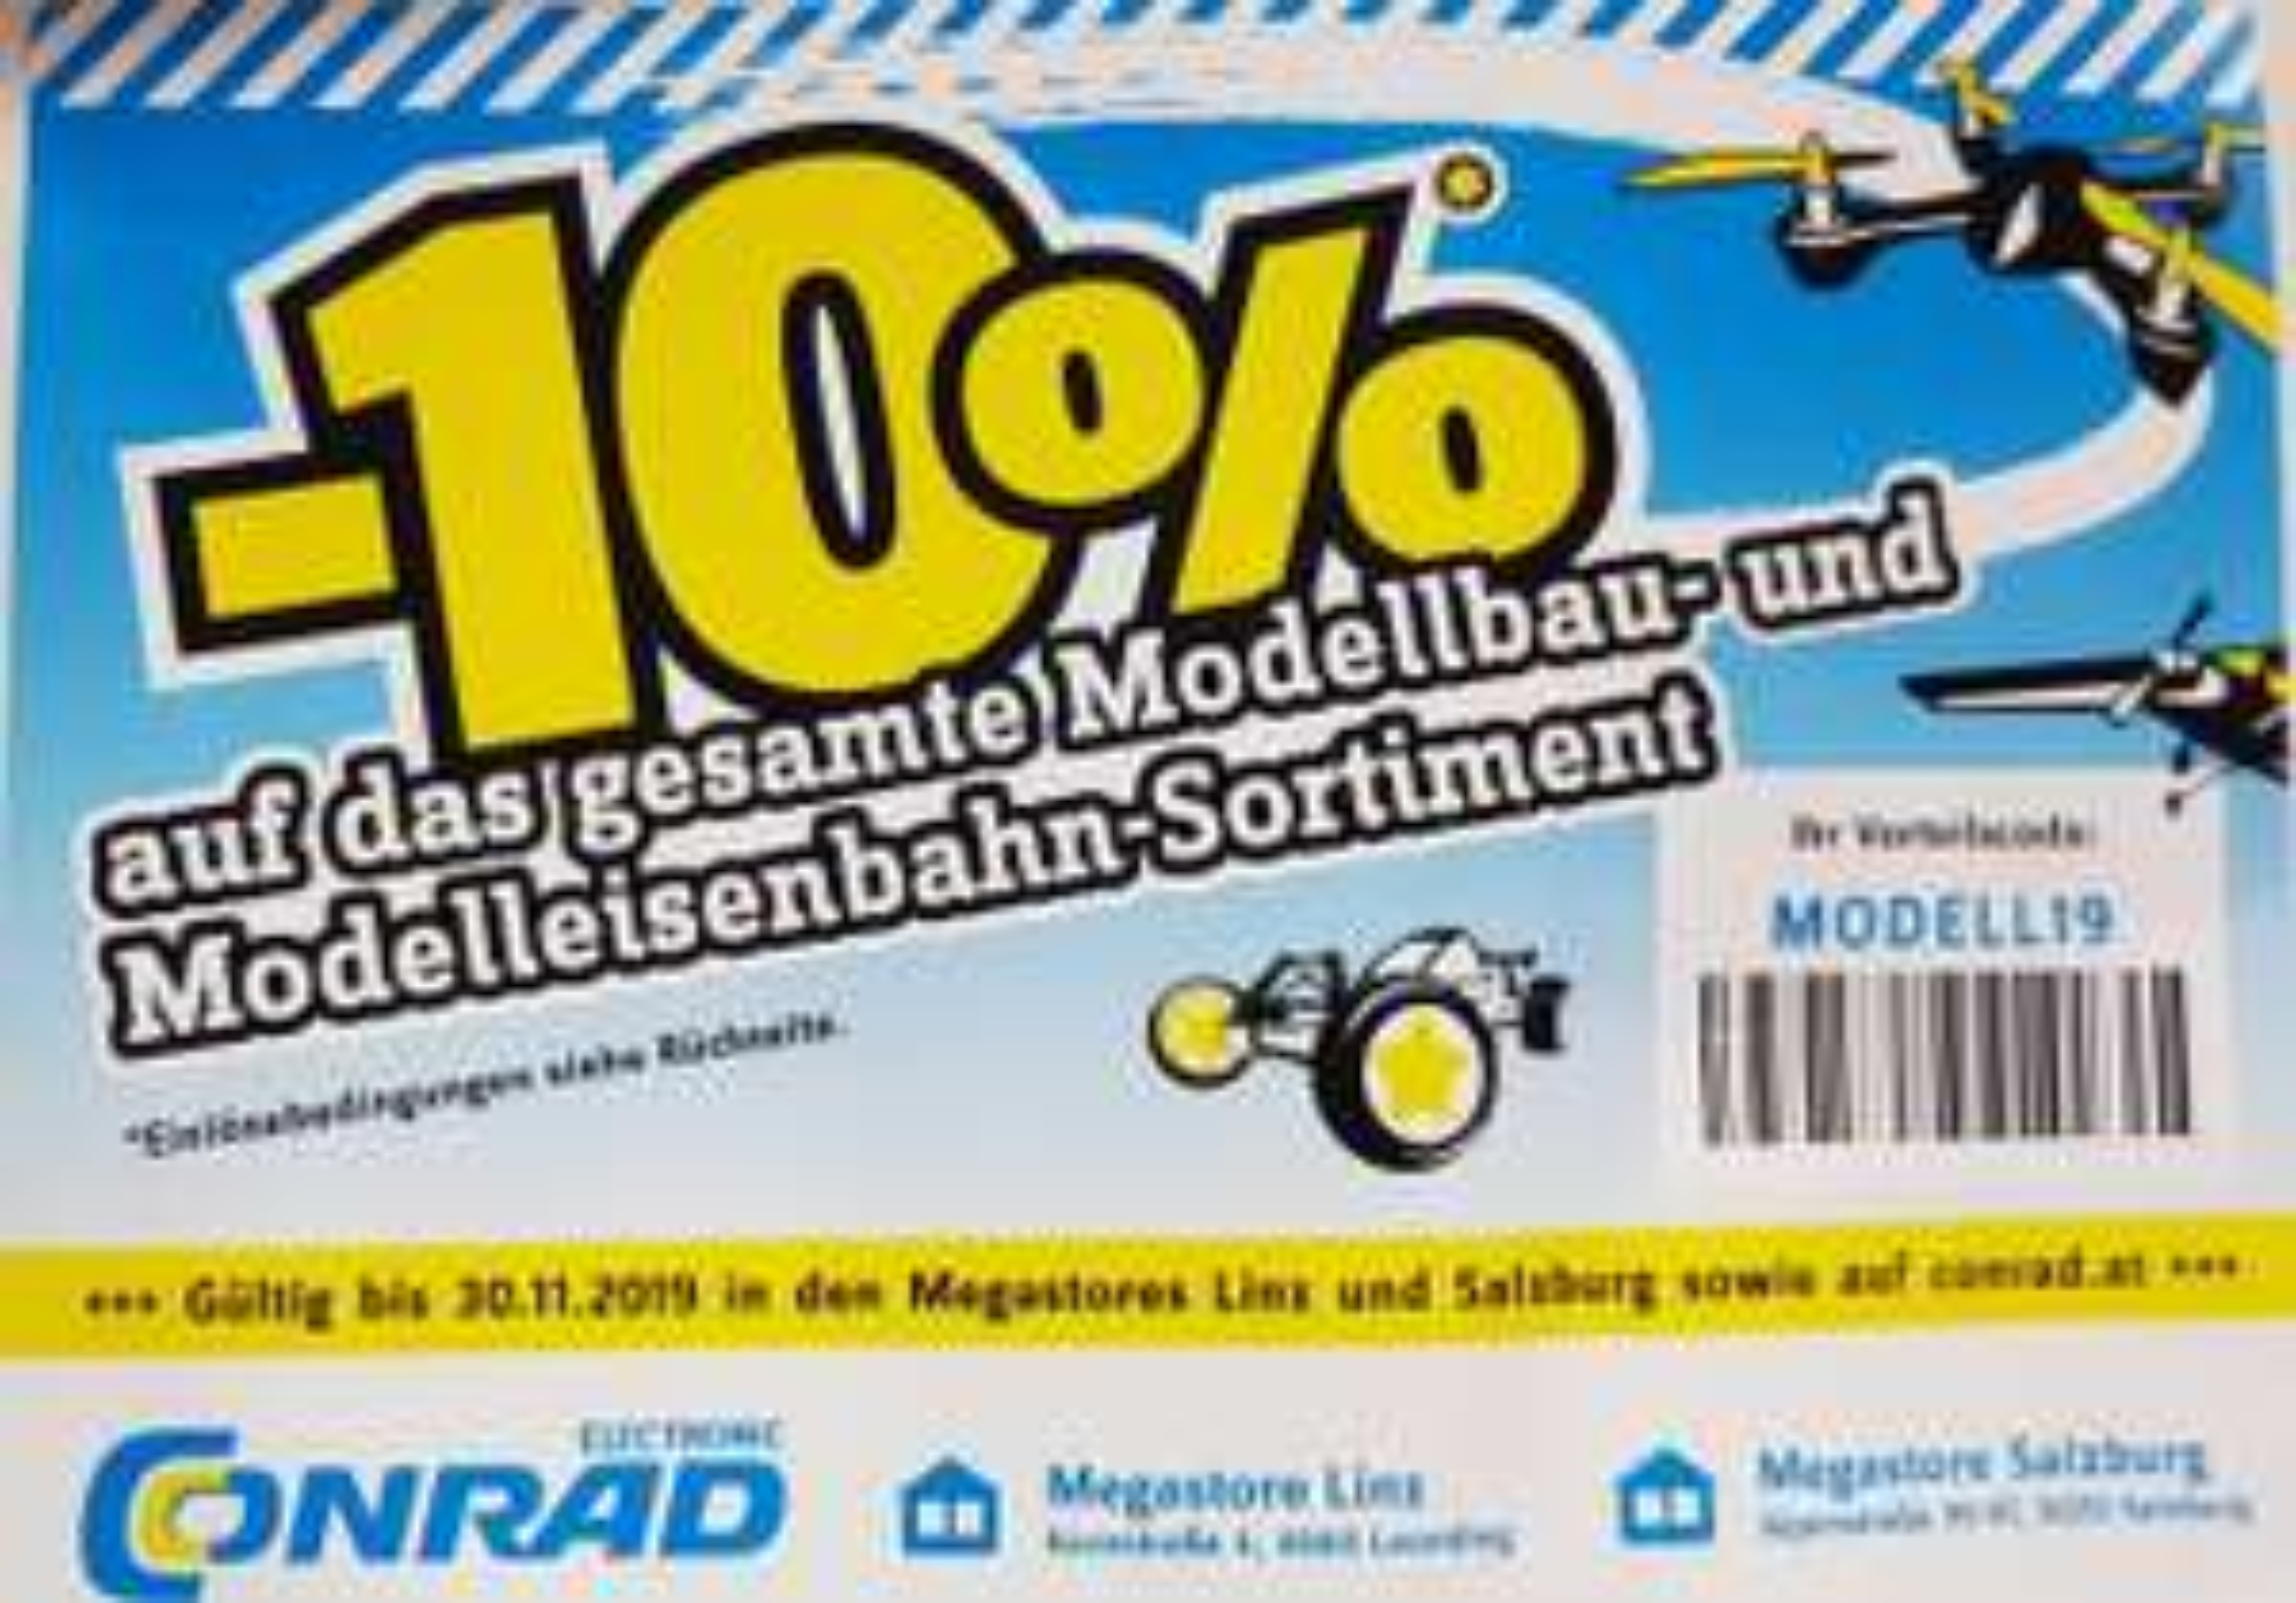 -10% bei Conrad auf Modellbau-Sortiment